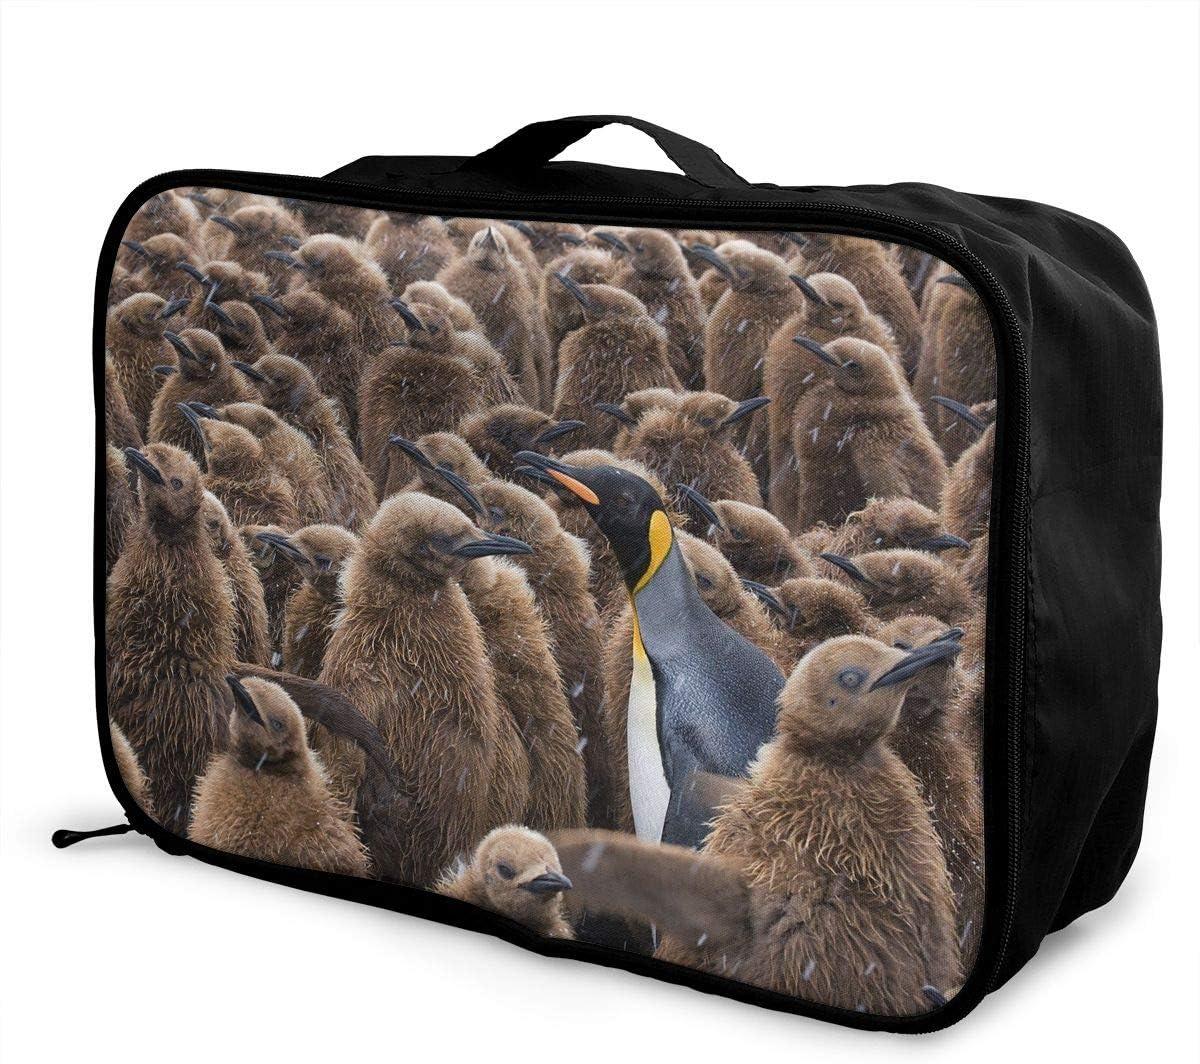 Pineapple Slice Travel Carry-on Luggage Weekender Bag Overnight Tote Flight Duffel In Trolley Handle